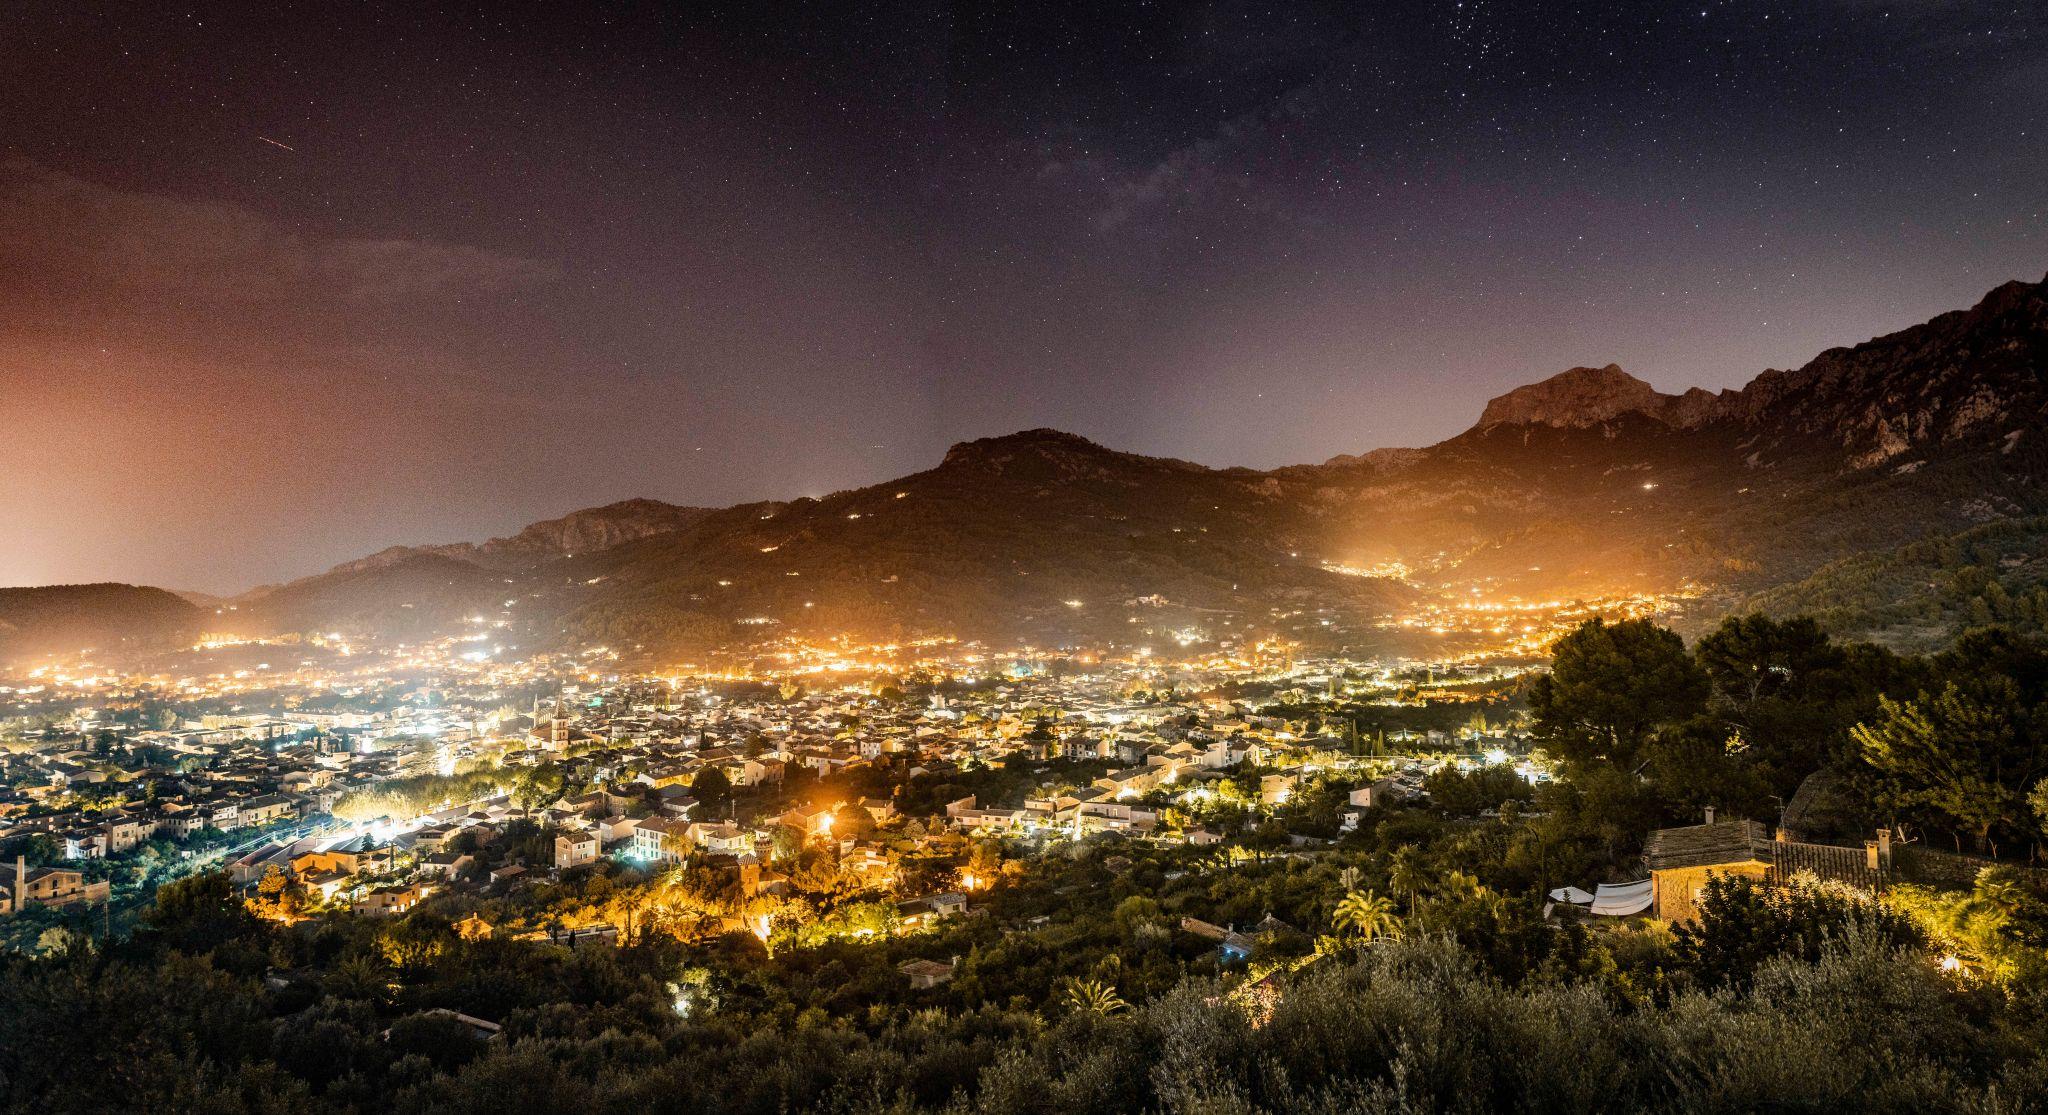 Sóller Nightscape, Spain